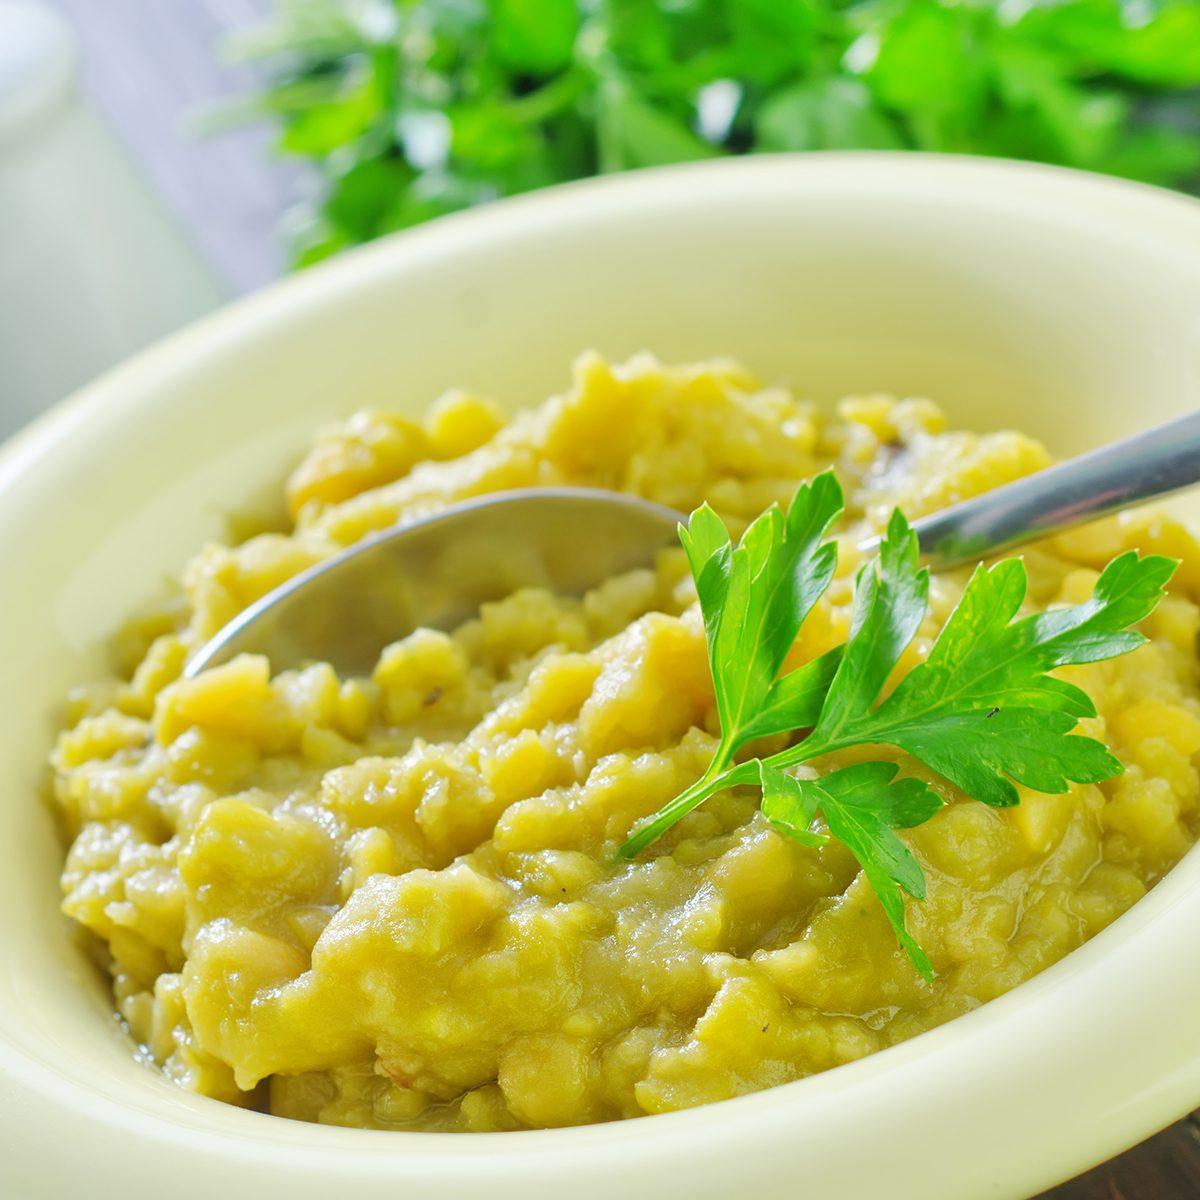 bowl of pea puree